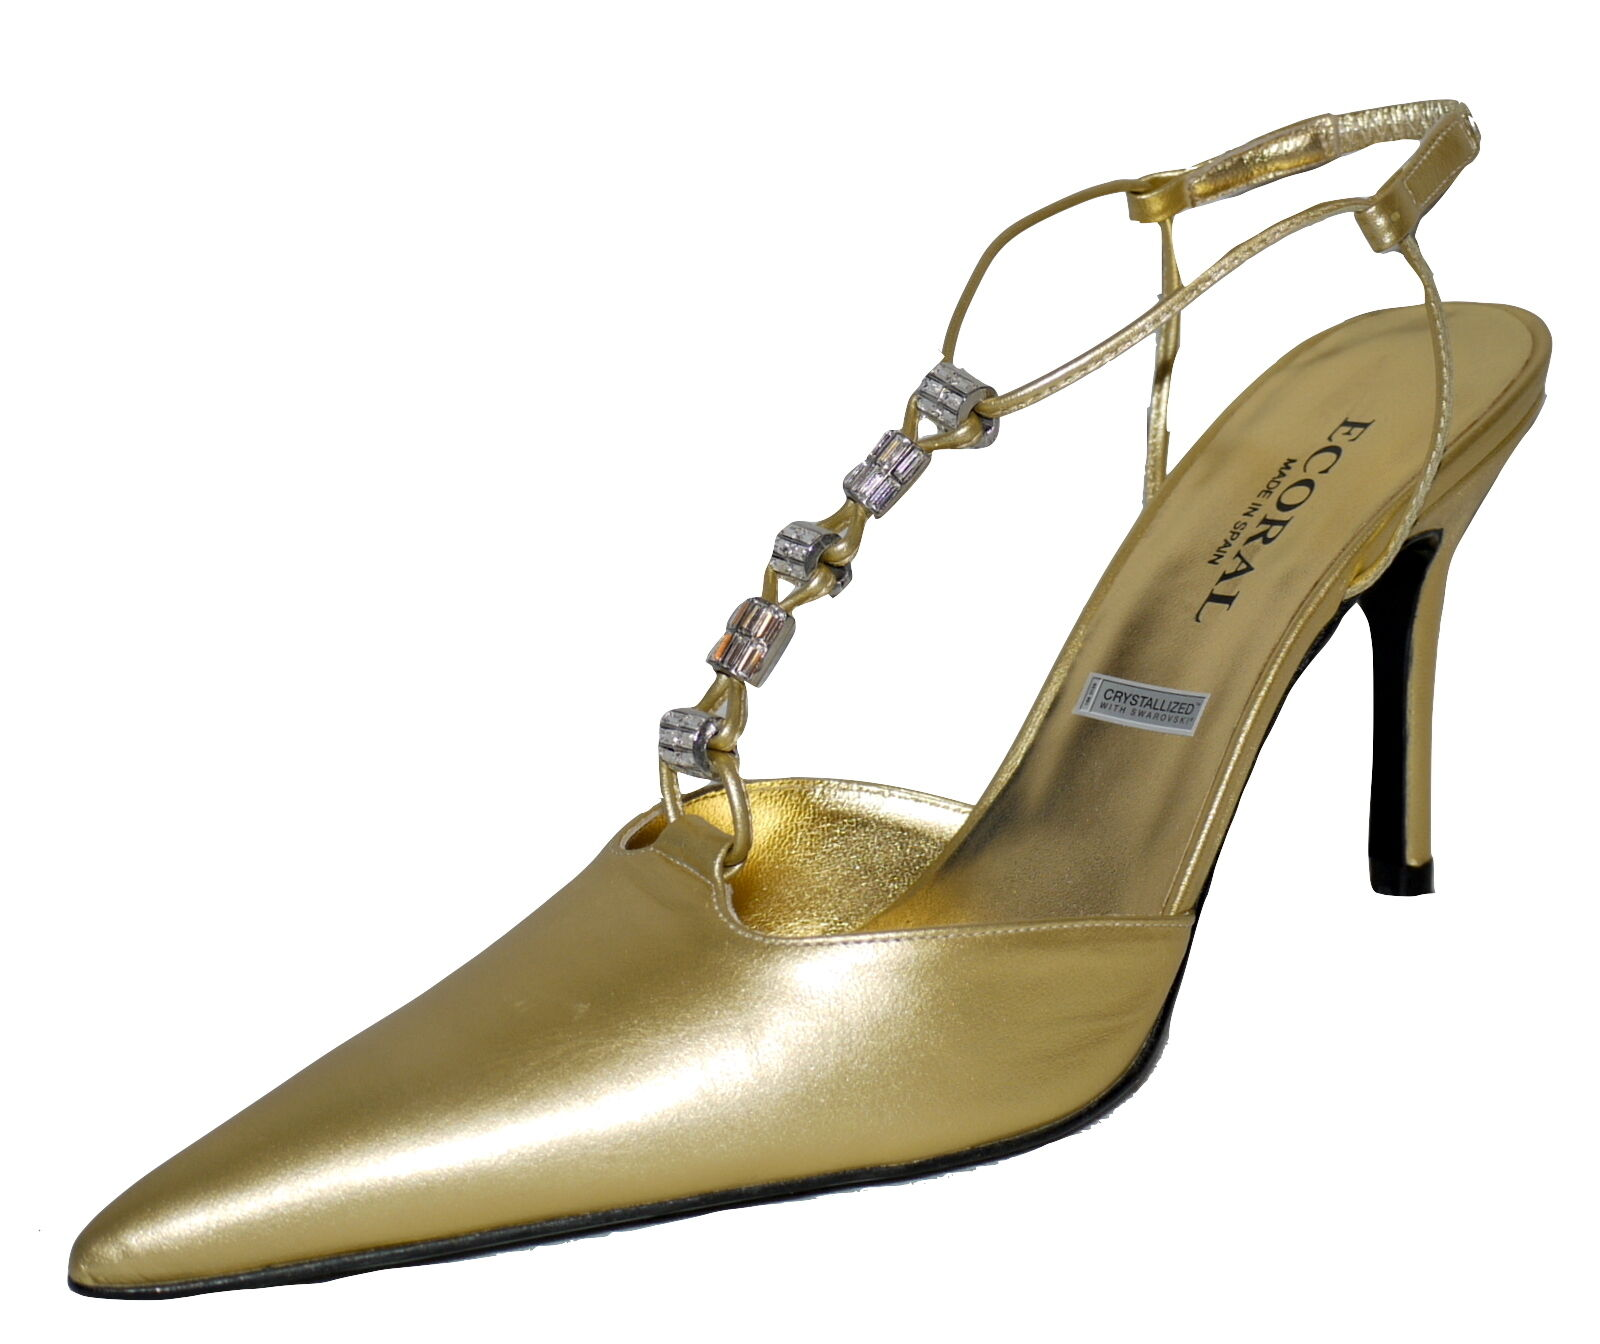 Ecoral Spanish Designer Sling Swarovski Back Schuhes Gold Leder With Swarovski Sling Elements f85c14